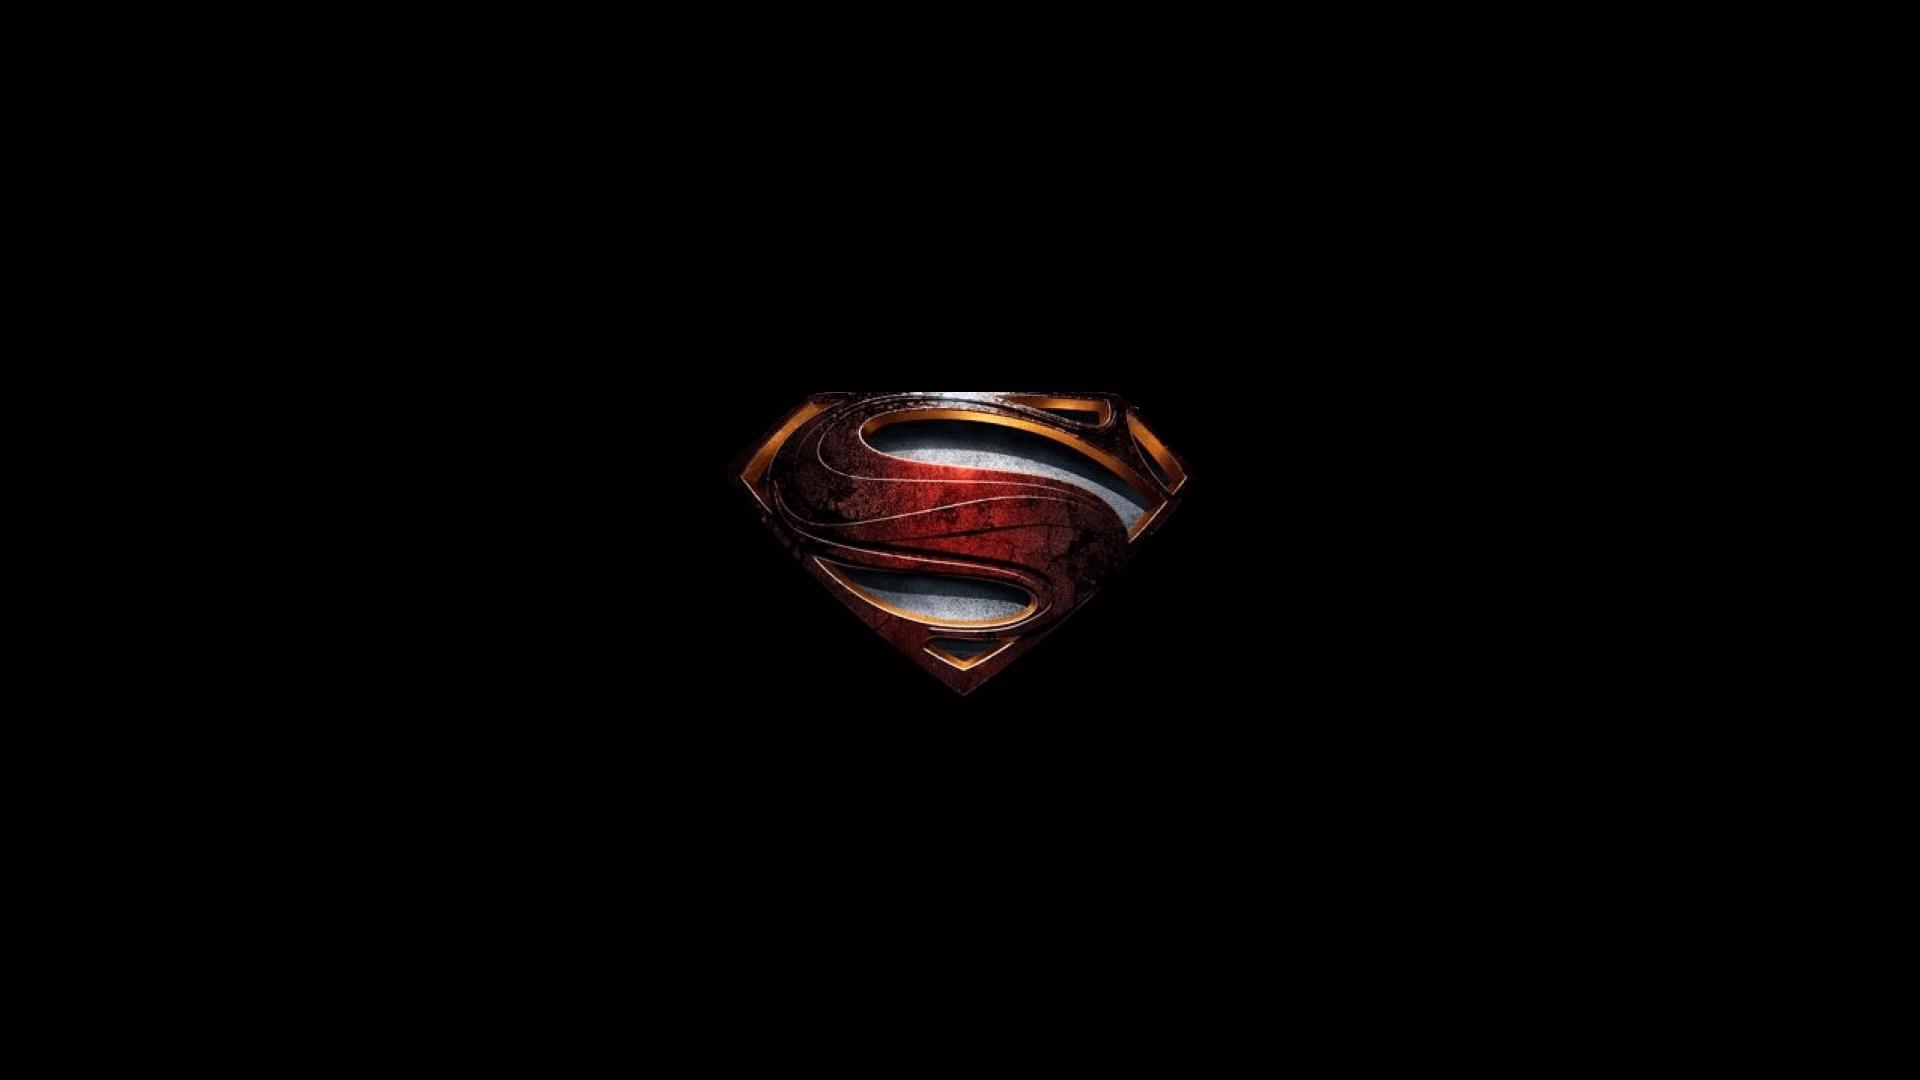 superheroes logos wallpapers wallpaper cave